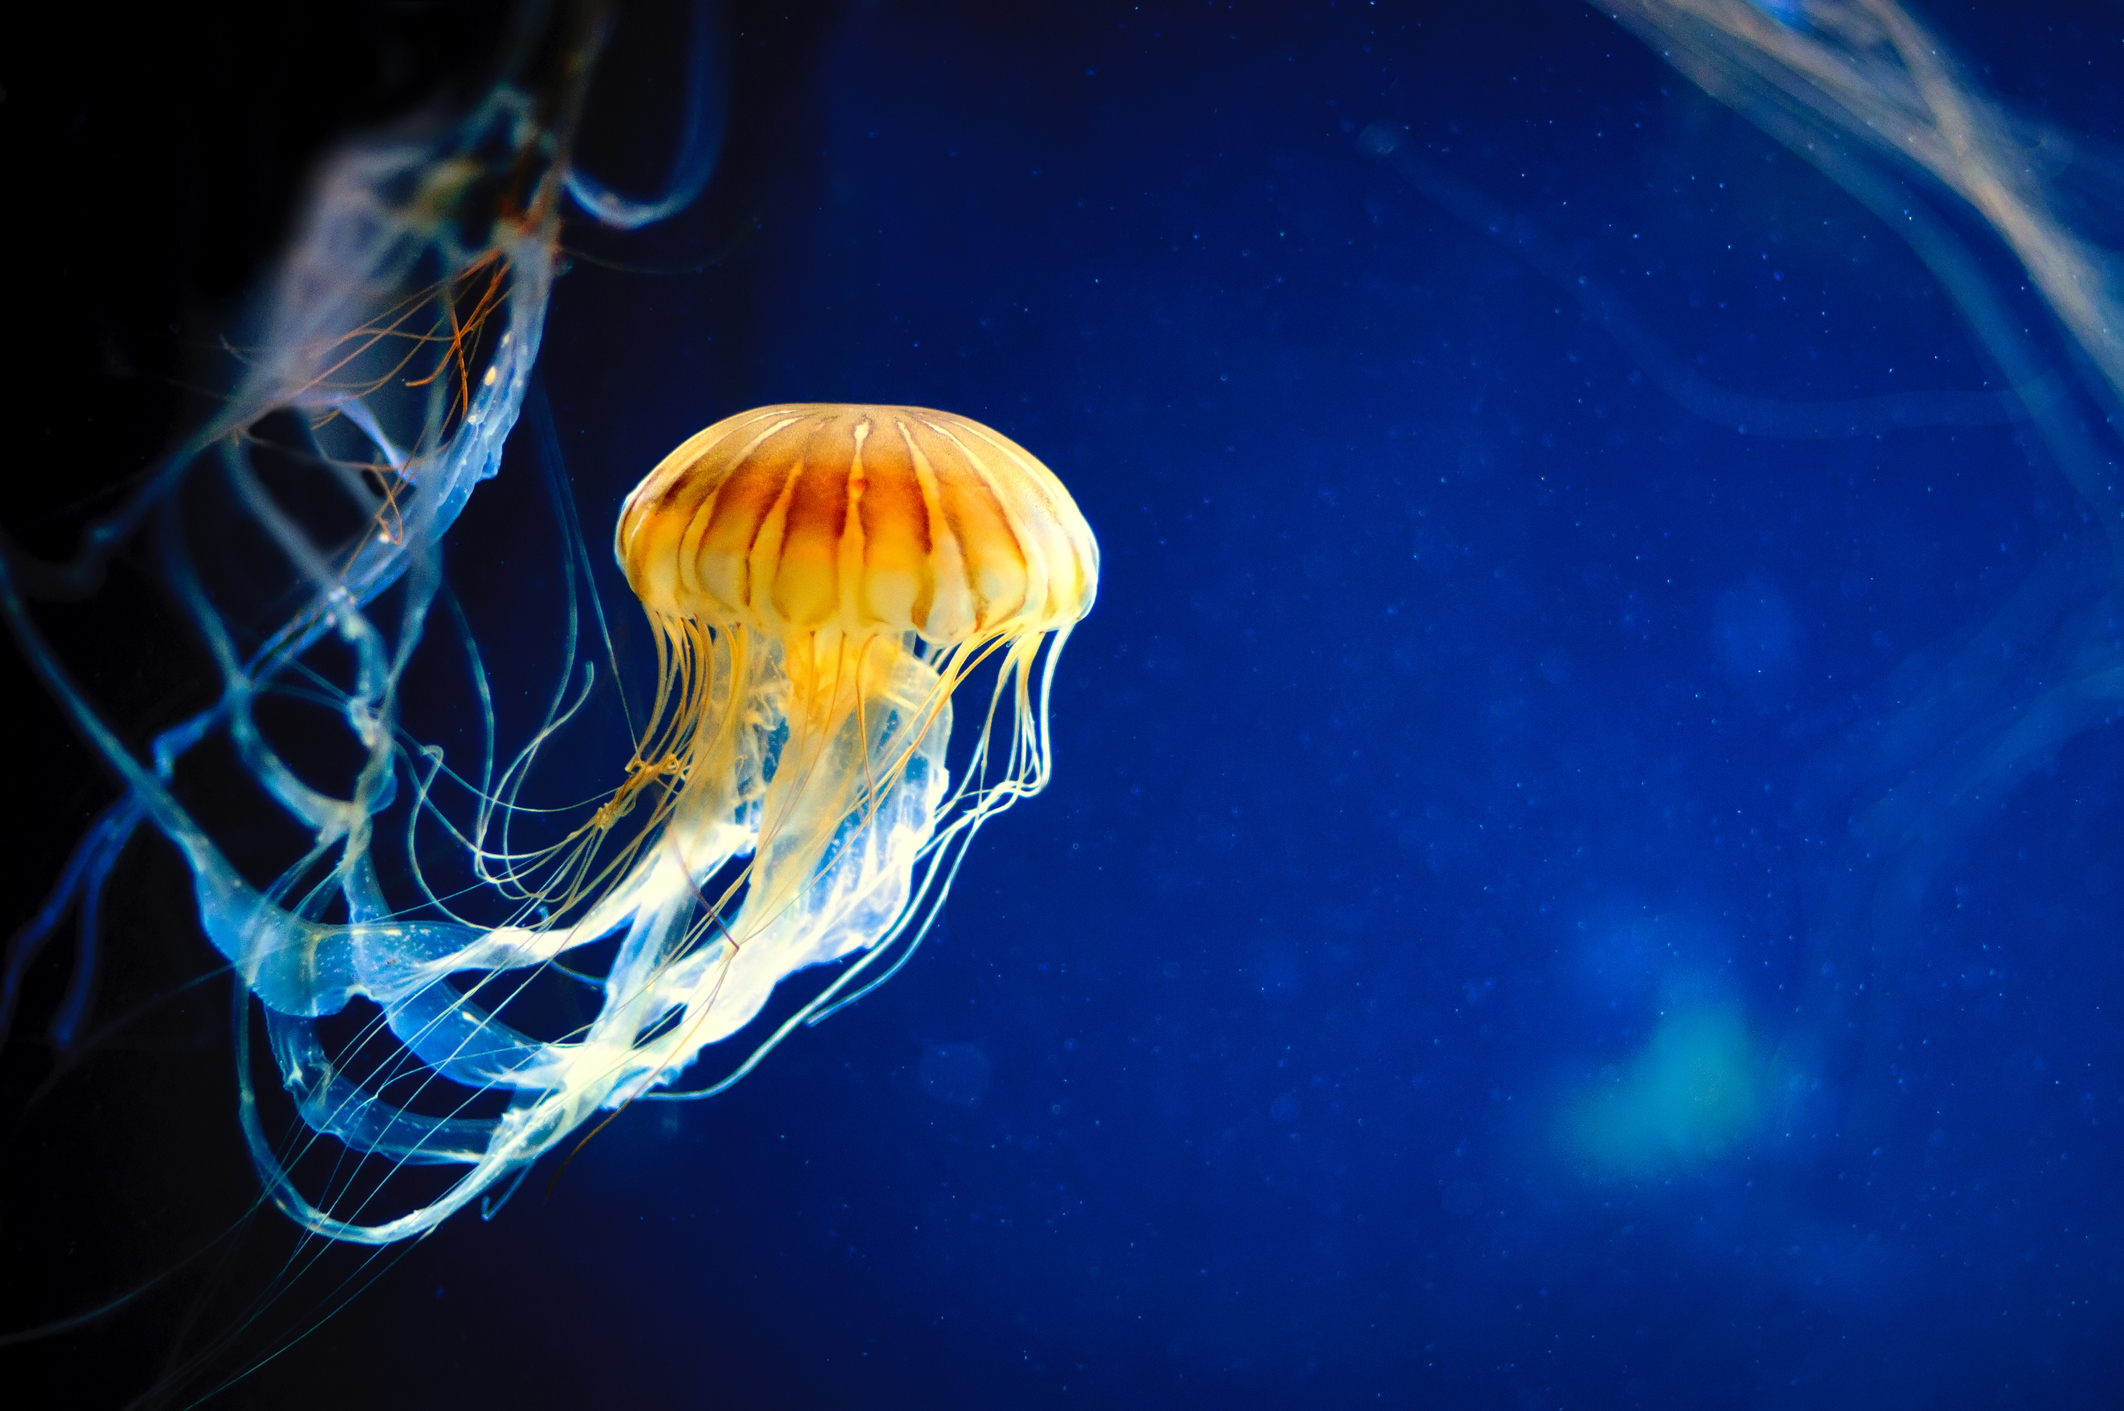 A jellyfish swims in a deep blue sea.